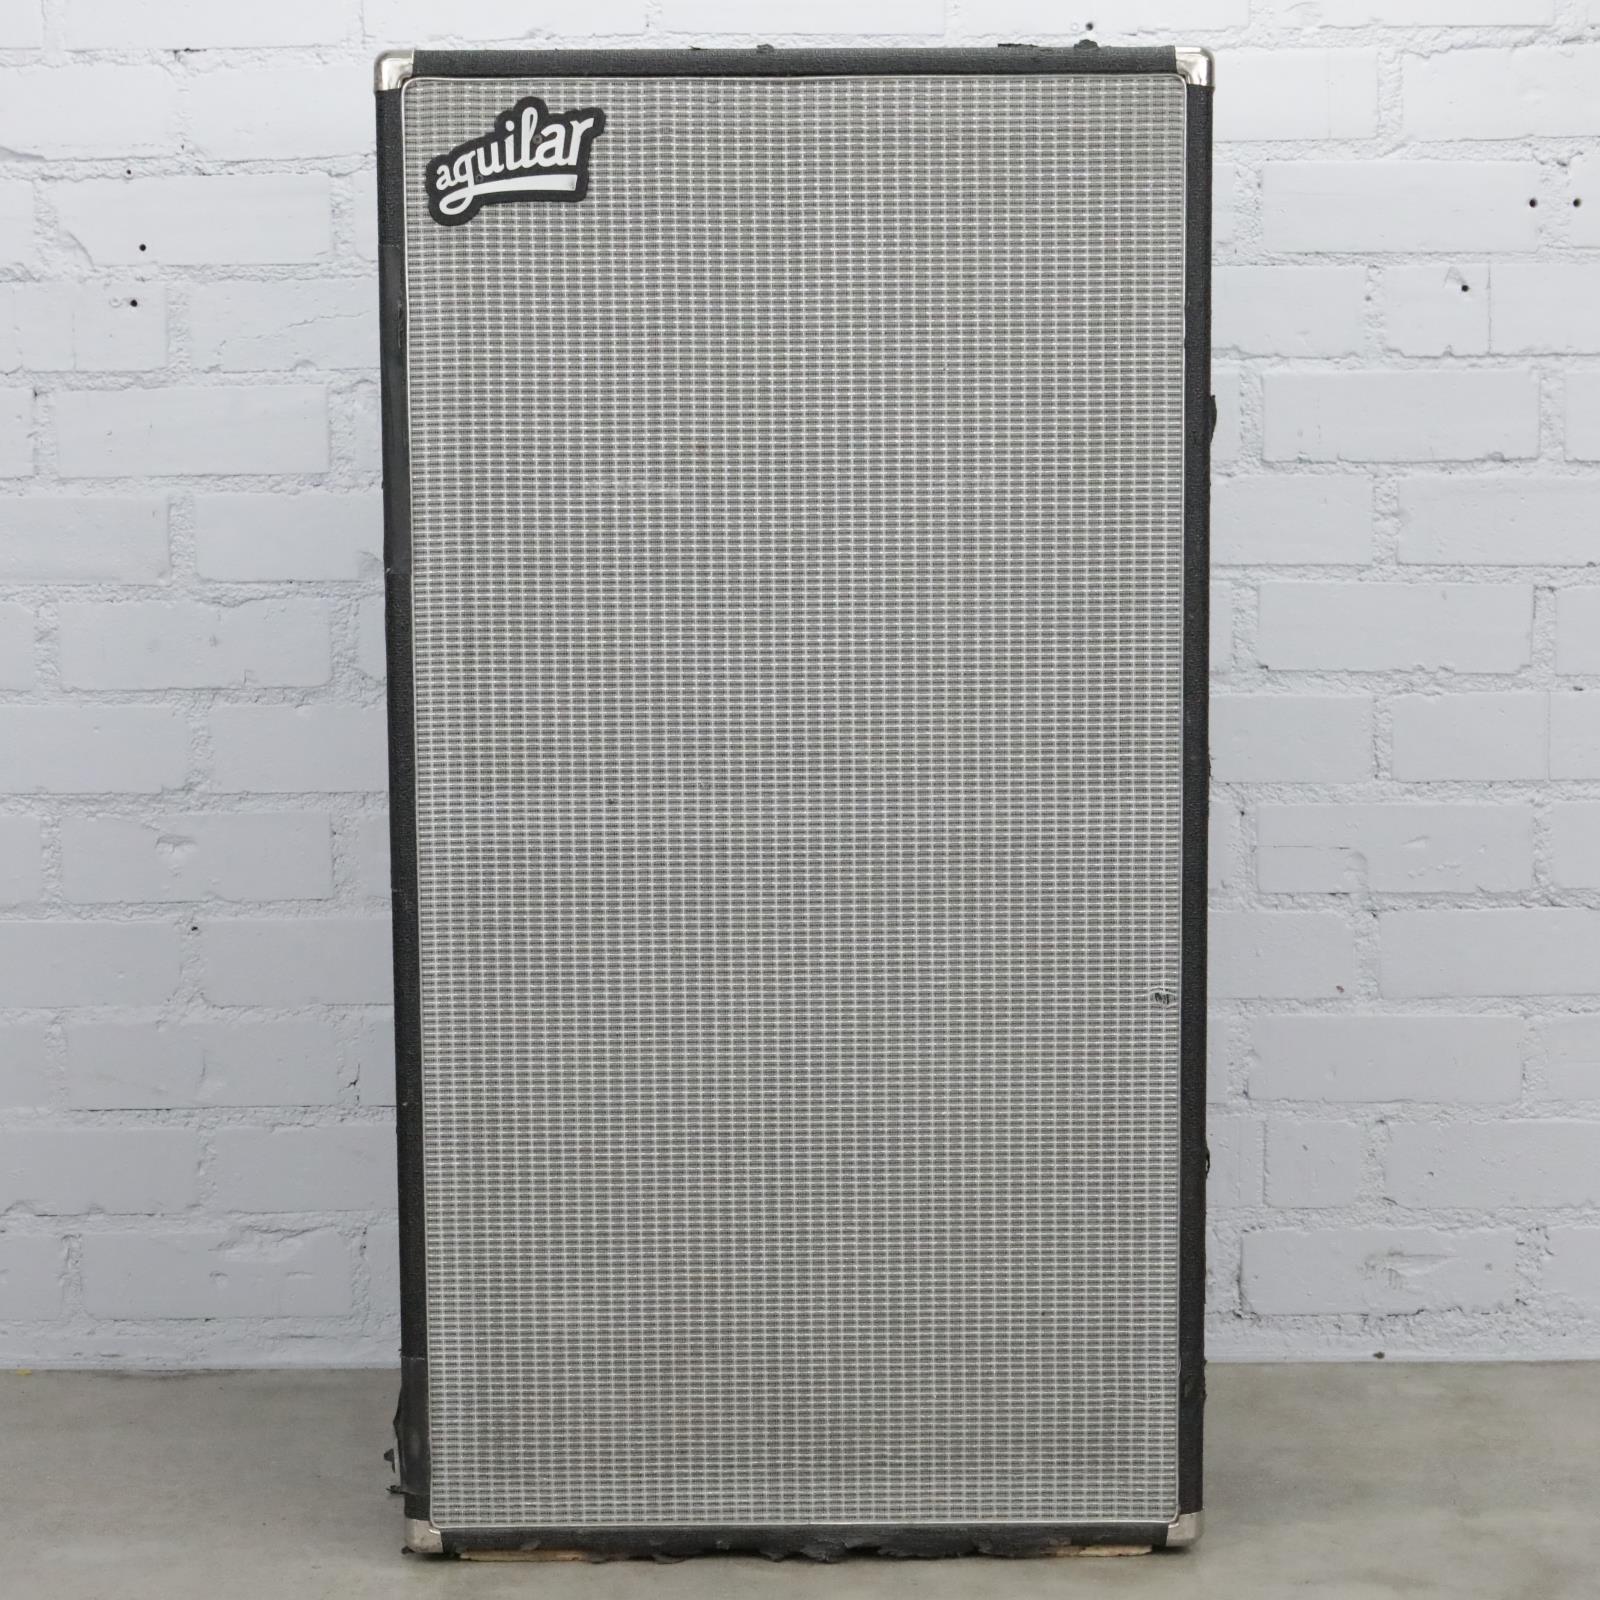 Aguilar DB810 8x10 Bass Speaker Cabinet #40746